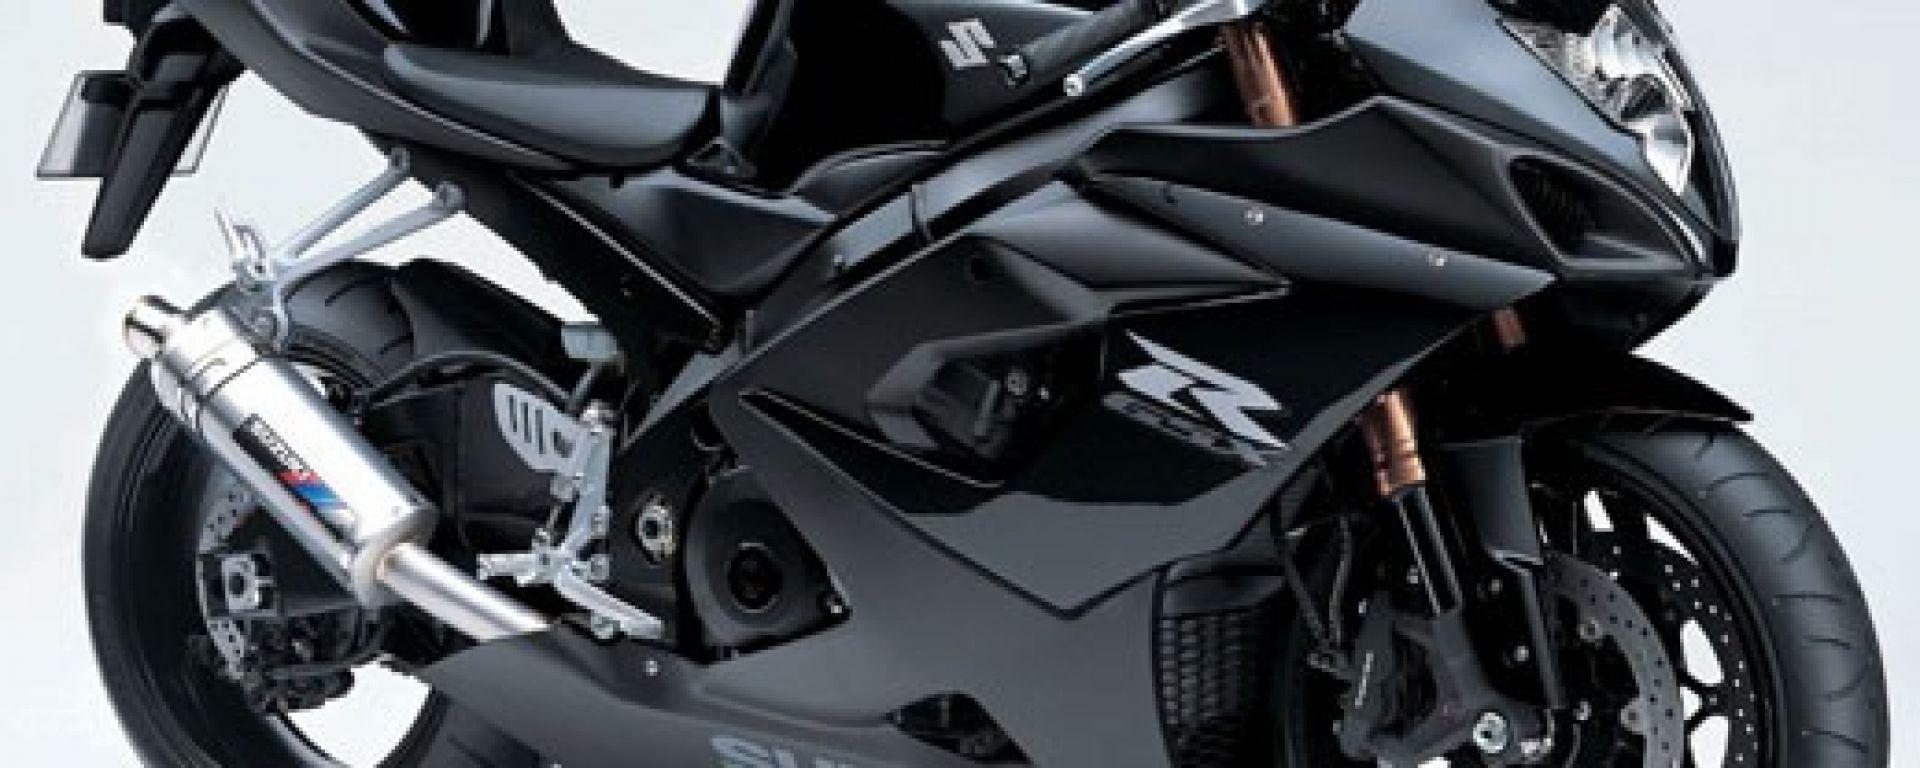 SUZUKI: tutta nera la GSX-R 1000